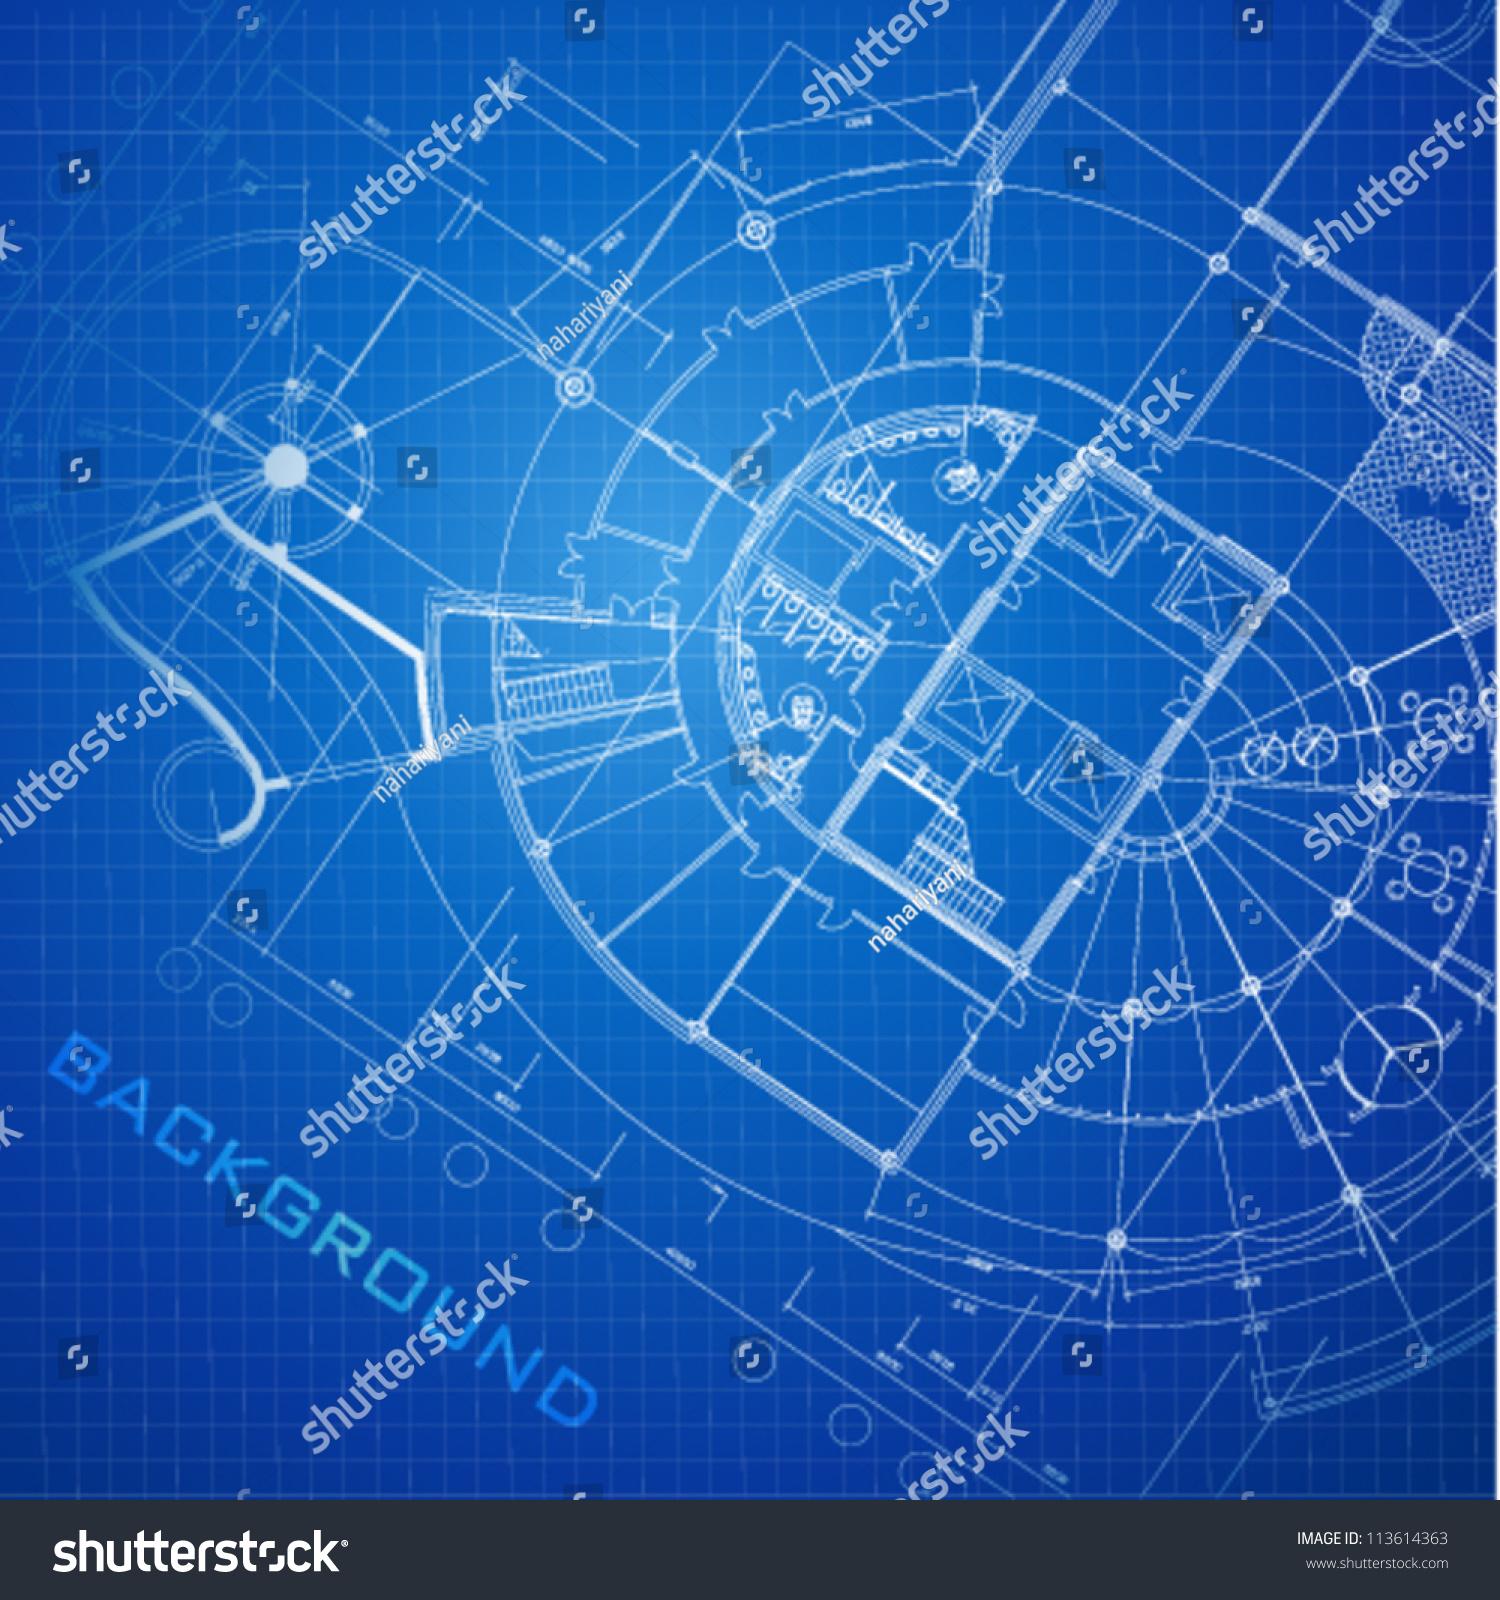 Urban blueprint vector architectural background part stock for Architecture design blueprint